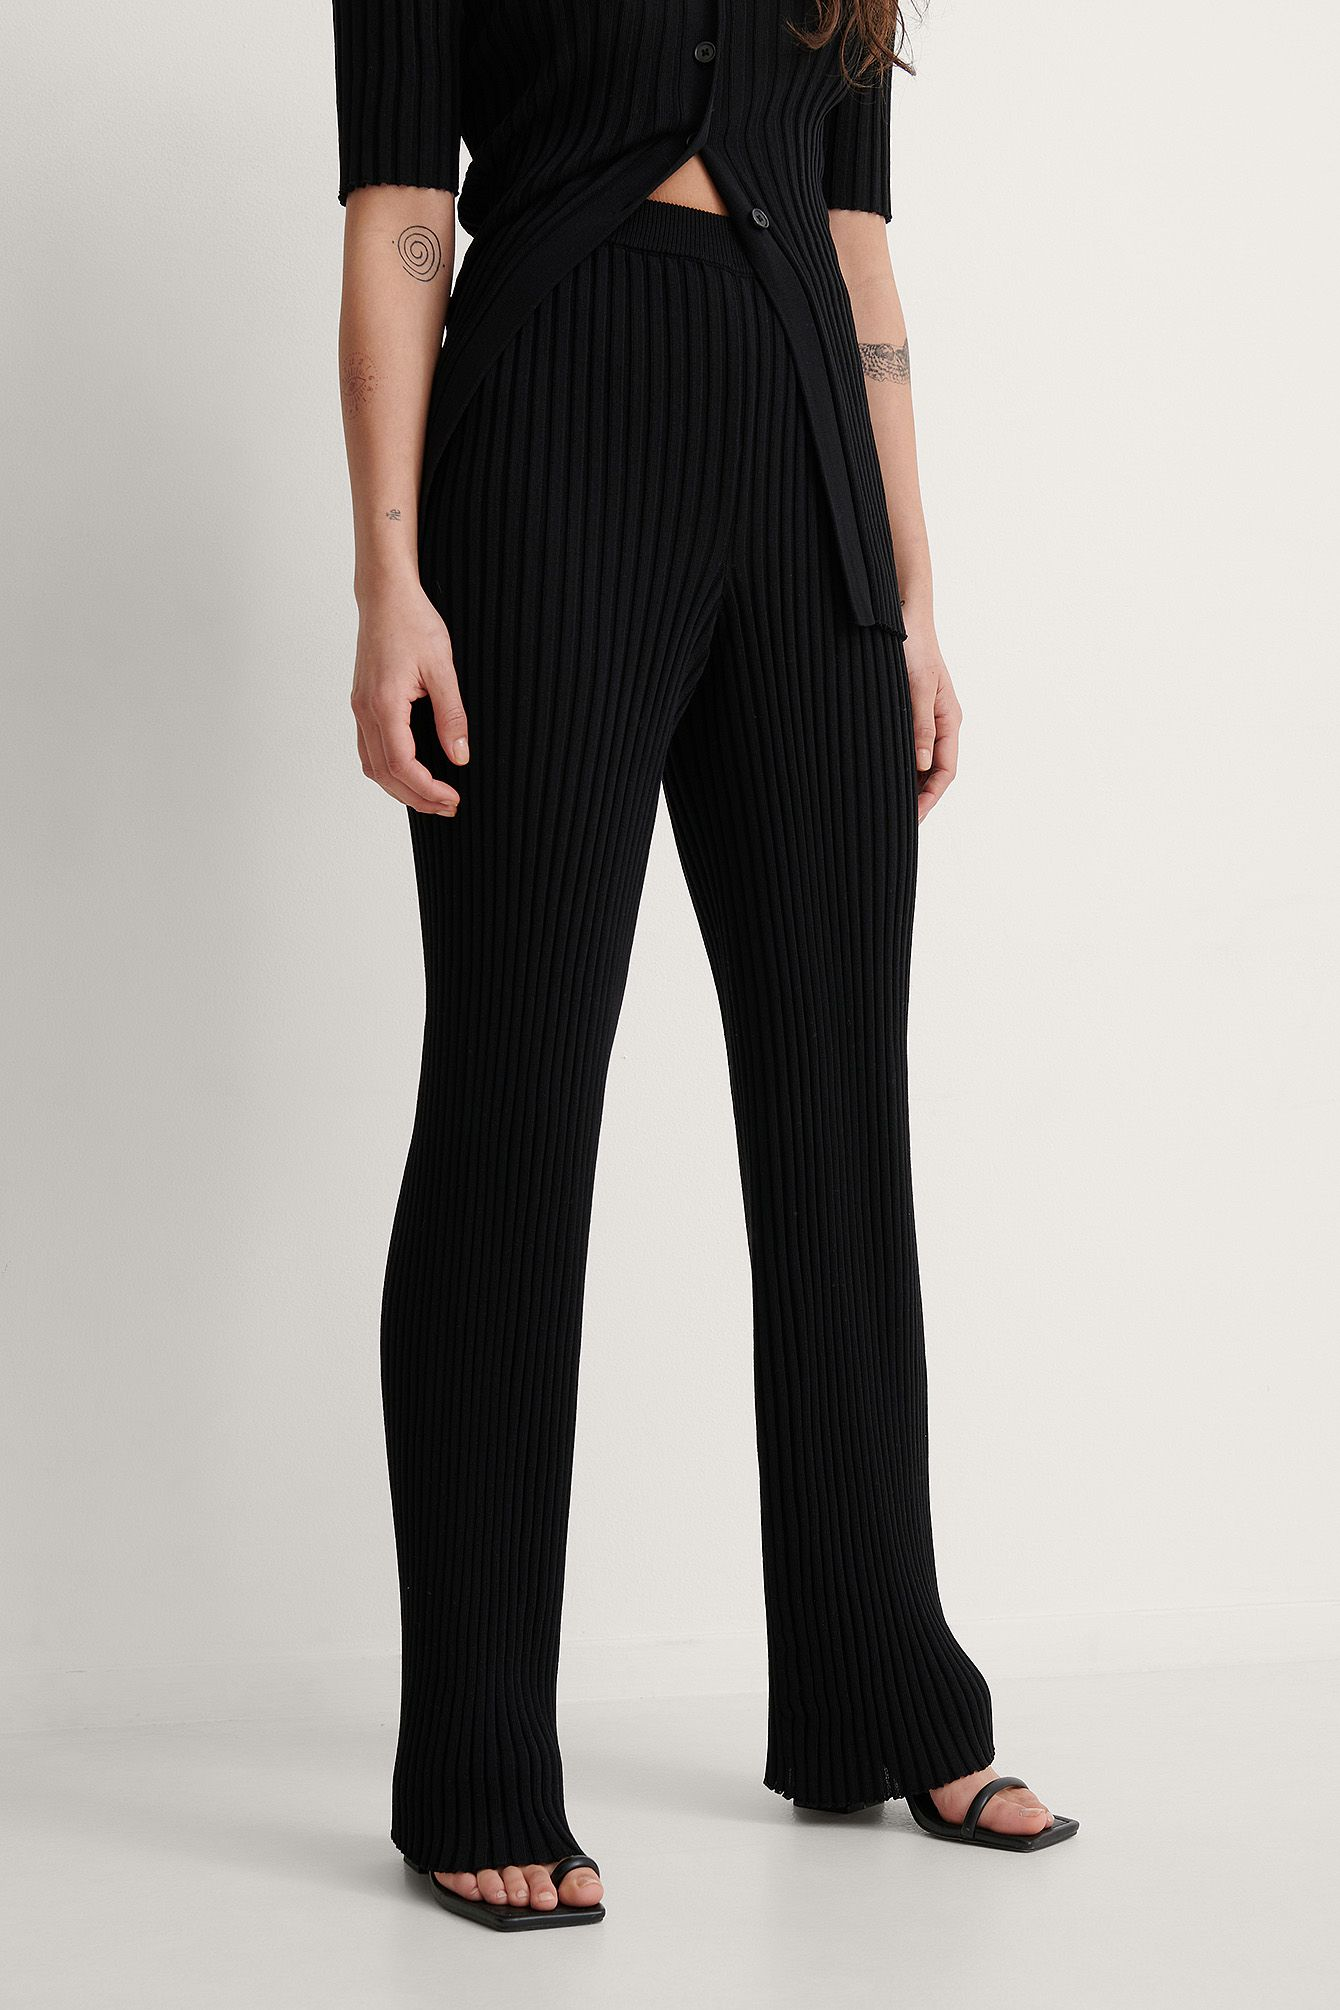 NA-KD løse bukser